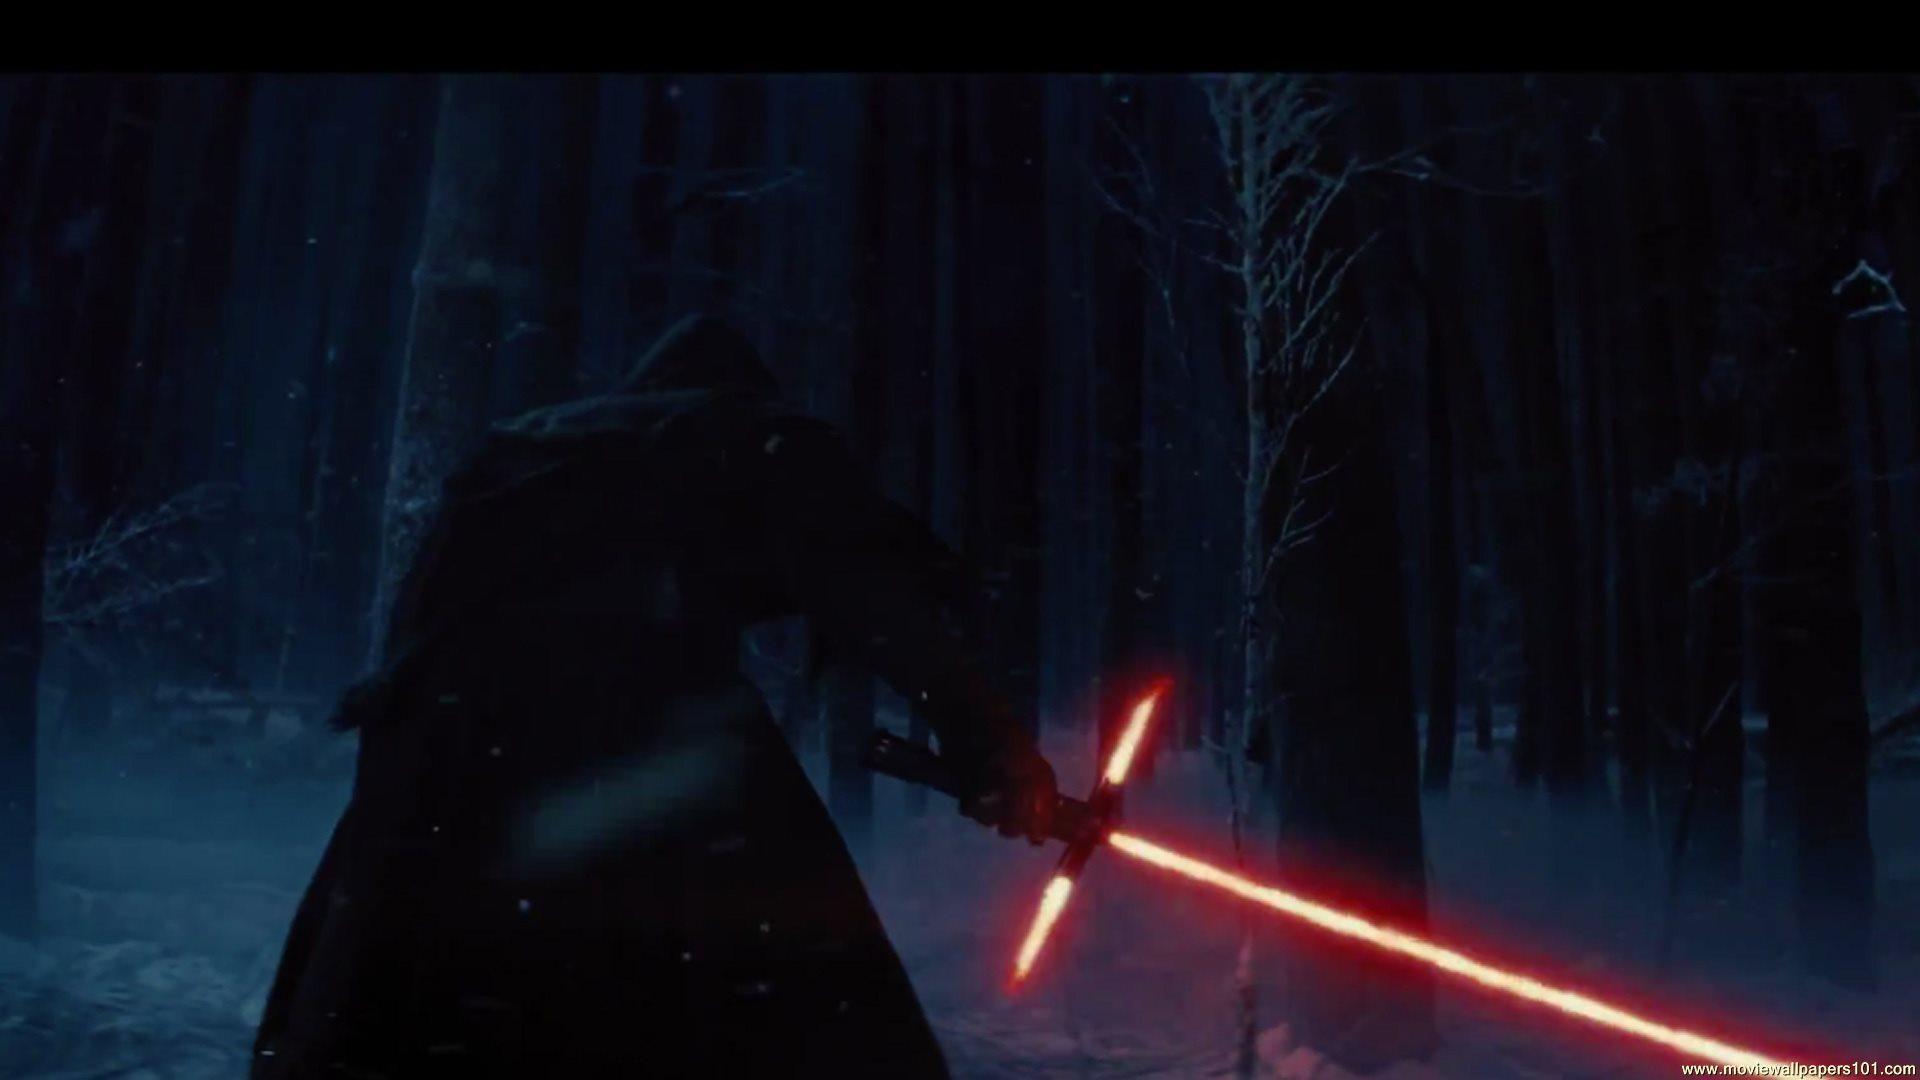 Star Wars Force Awakens 1080p: Star Wars Wallpaper 1080p